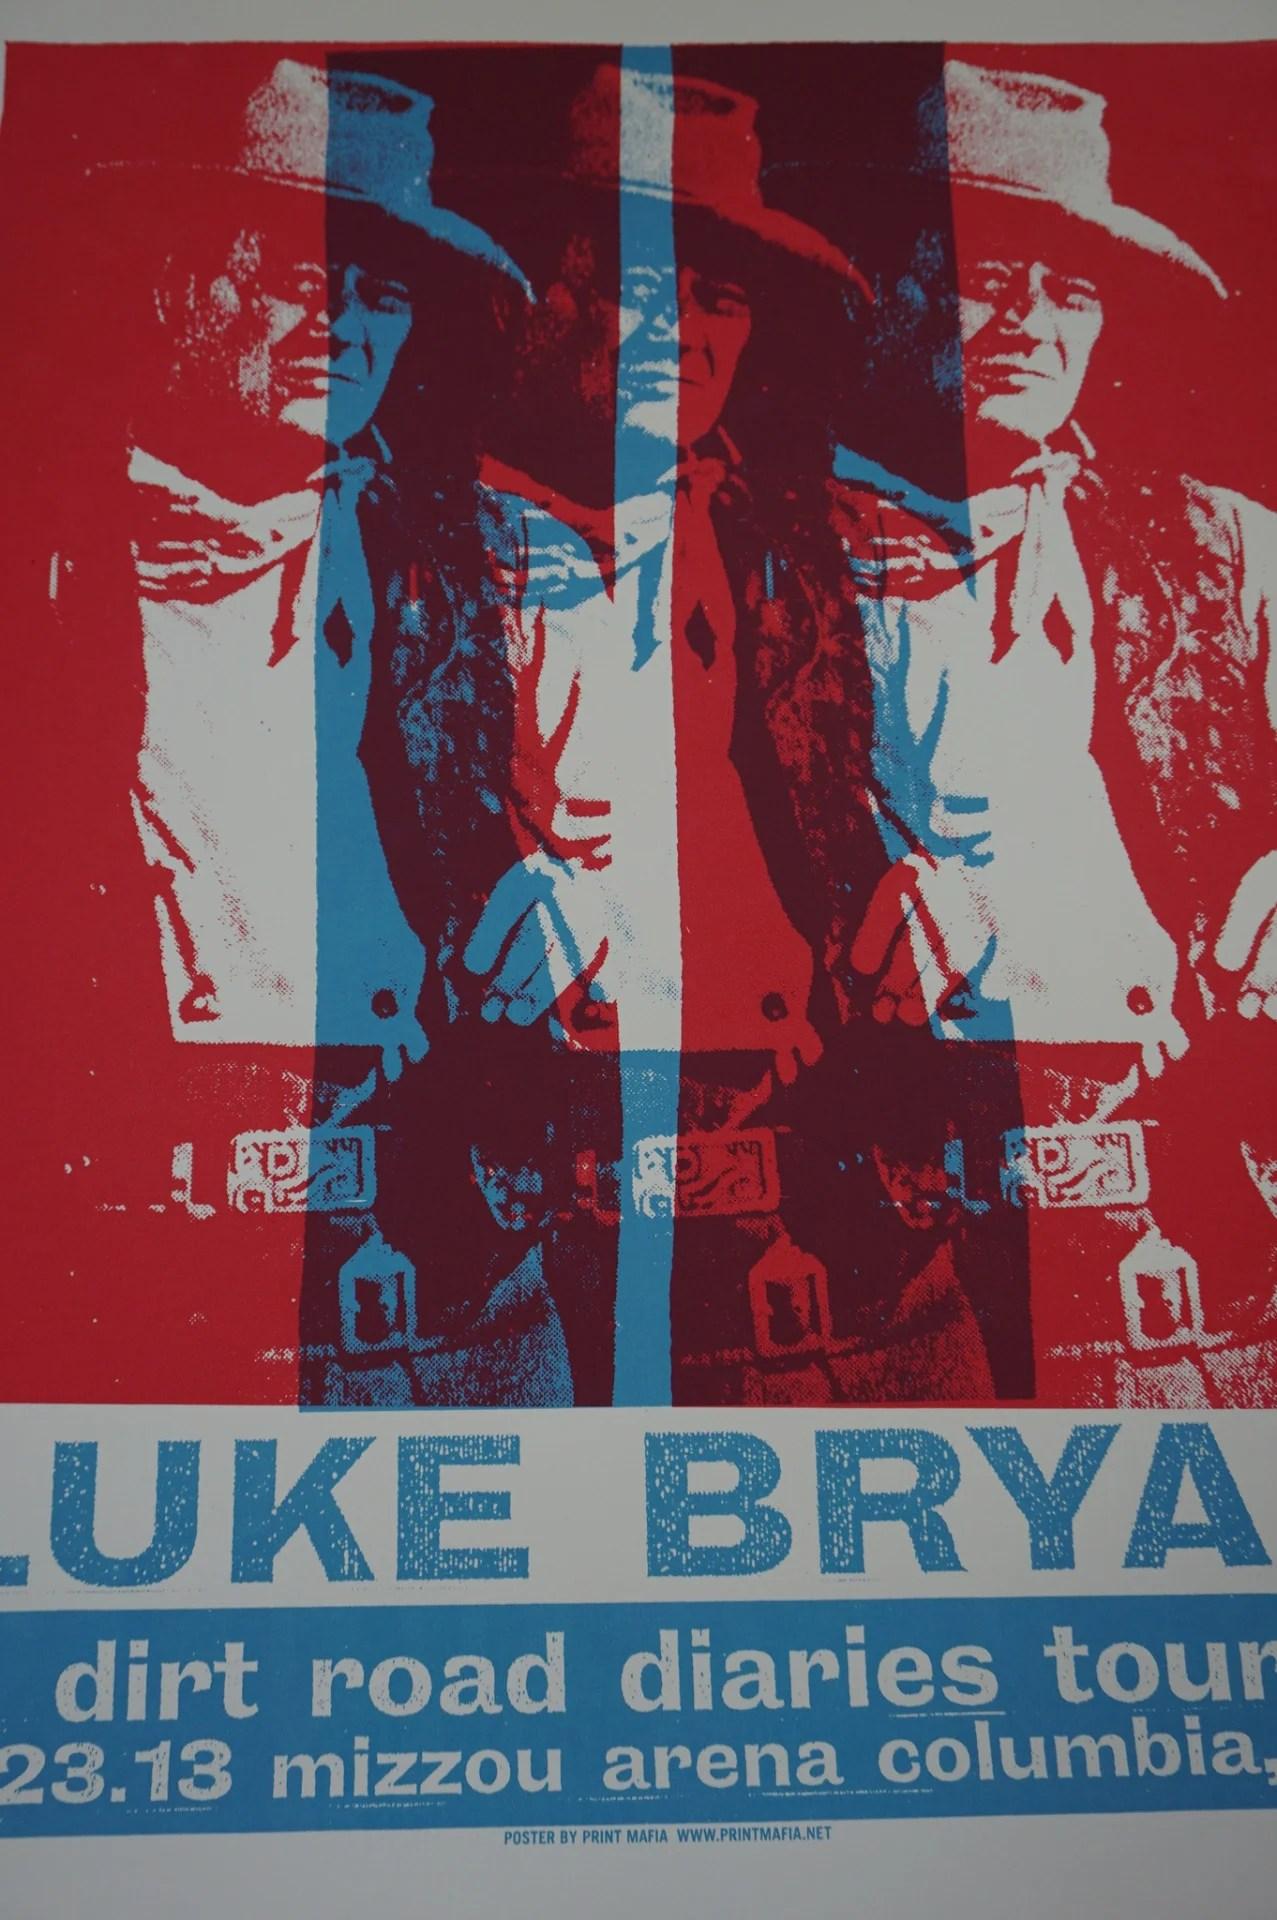 luke bryan 2013 print mafia poster columbia mo john wayne missou arena